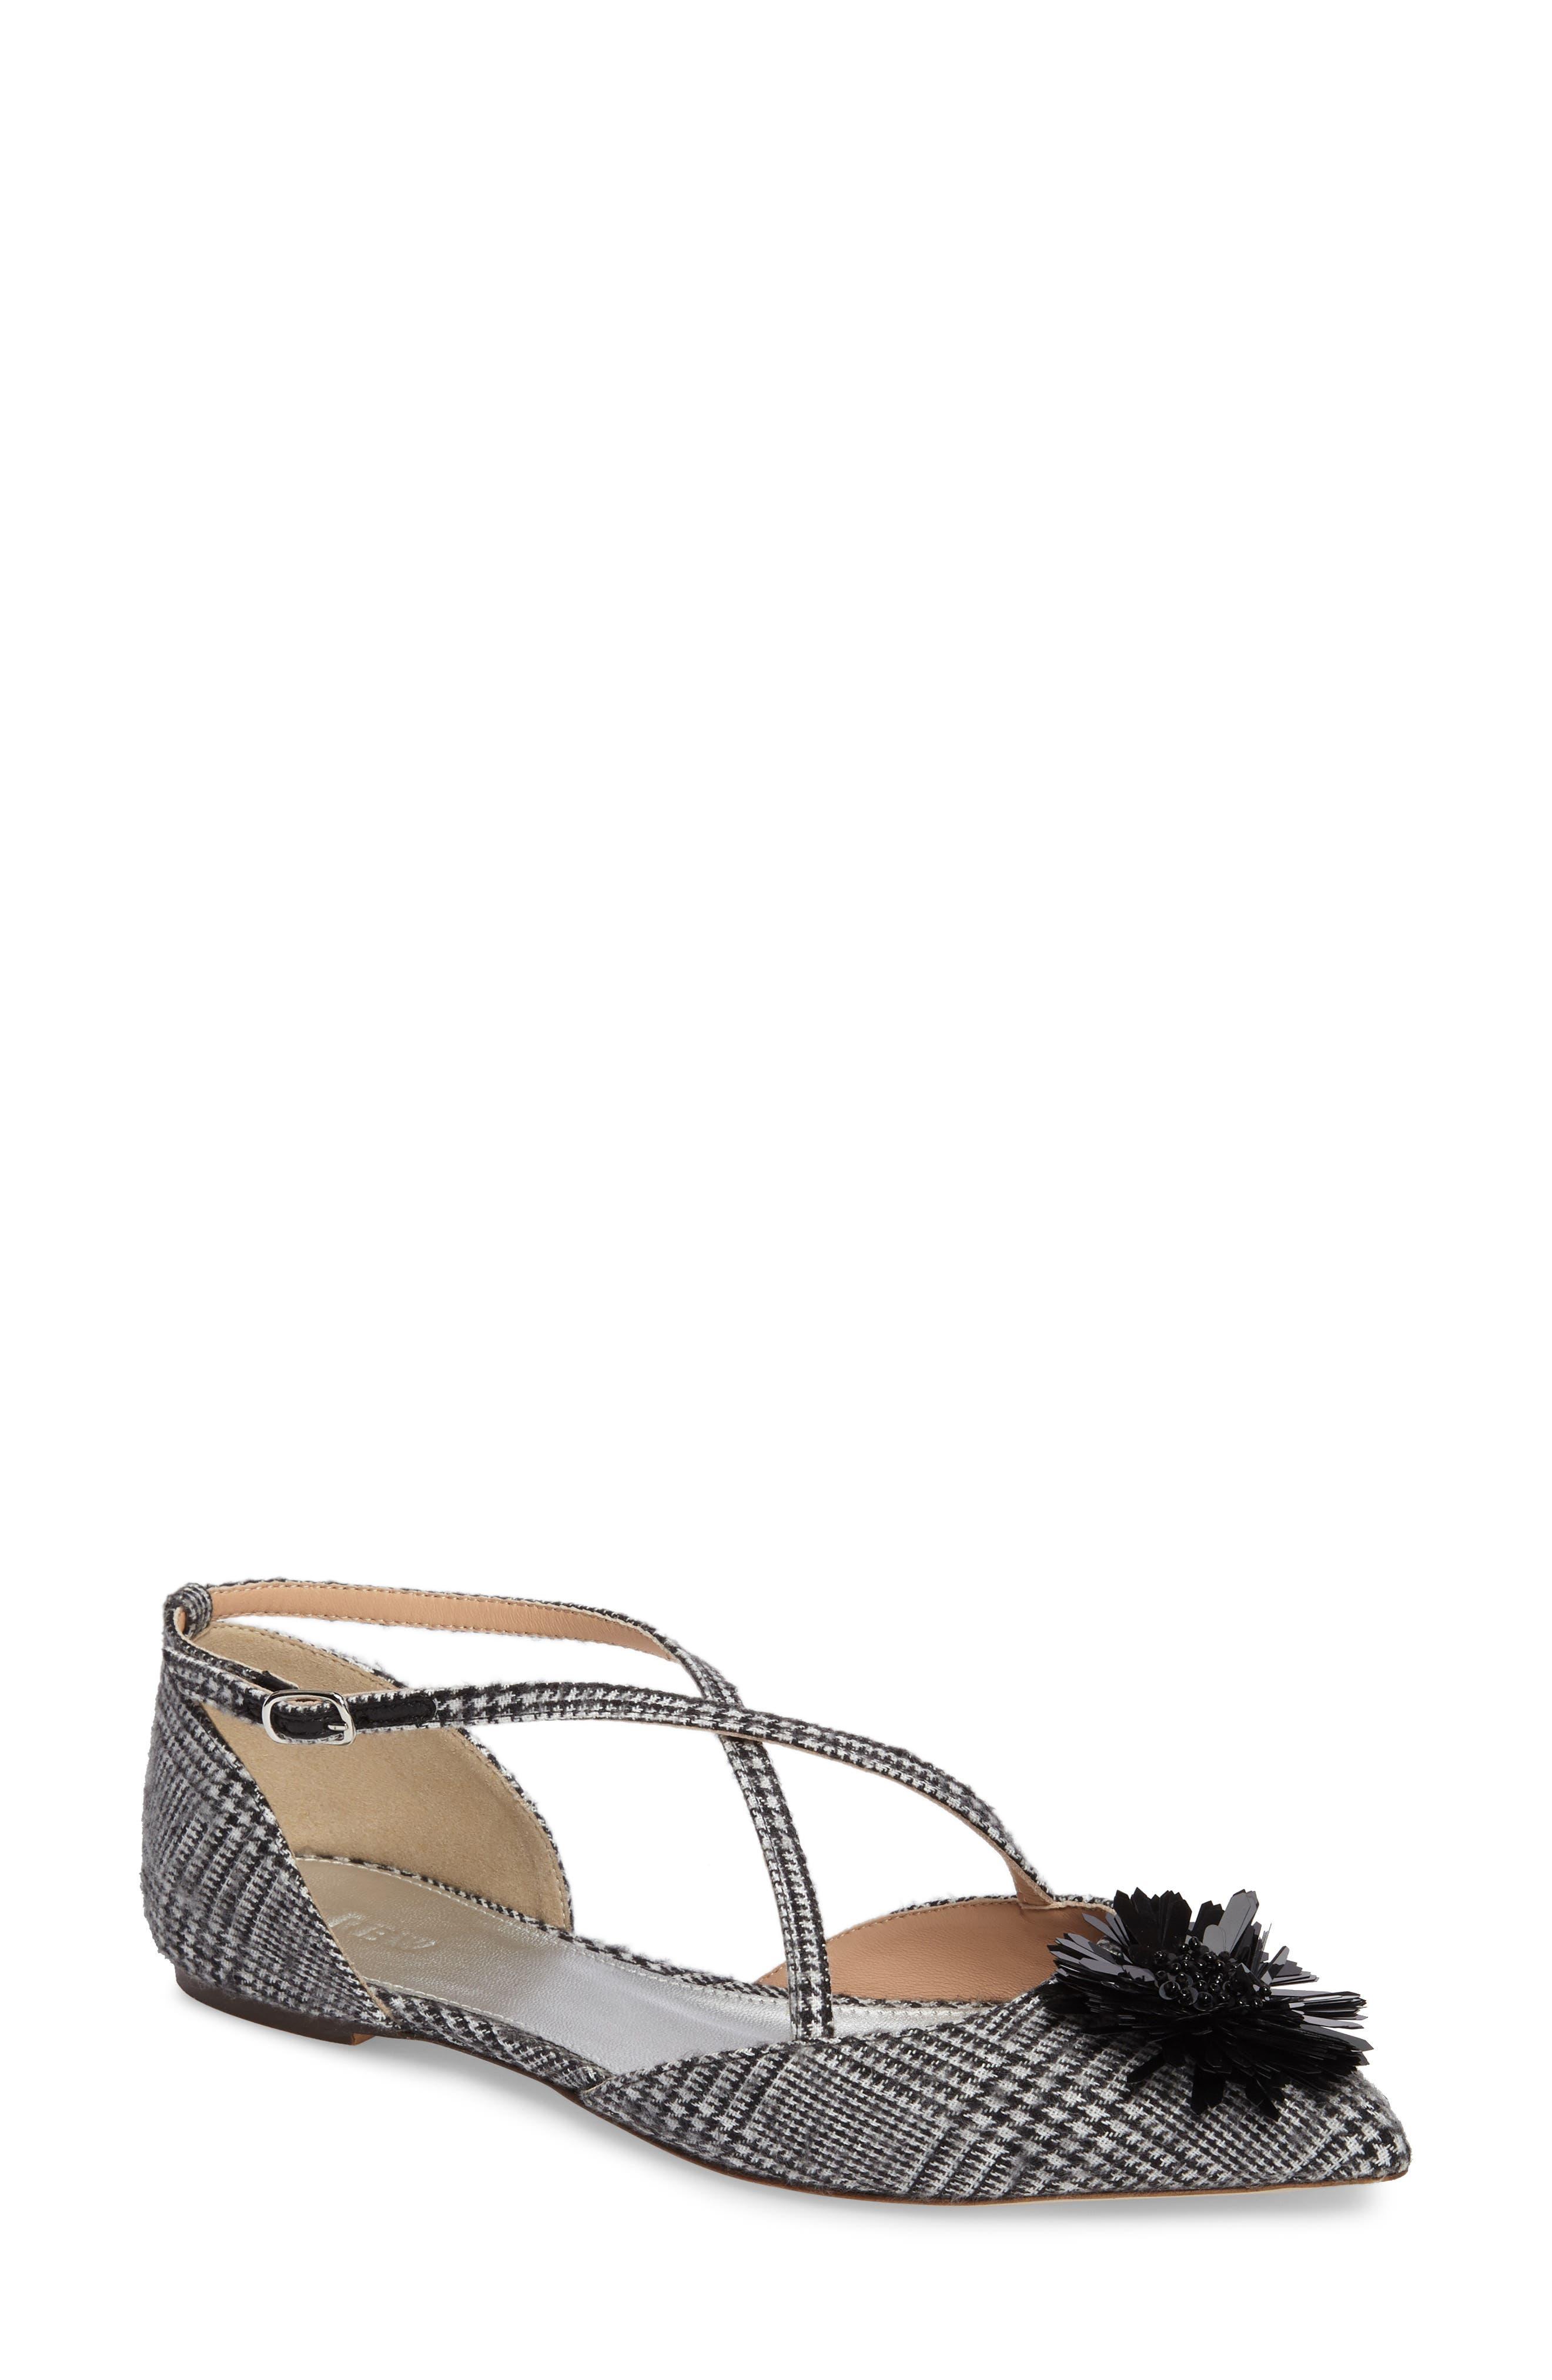 Sadie Cross Strap Pointy Toe Flat,                         Main,                         color, Black/ White Fabric